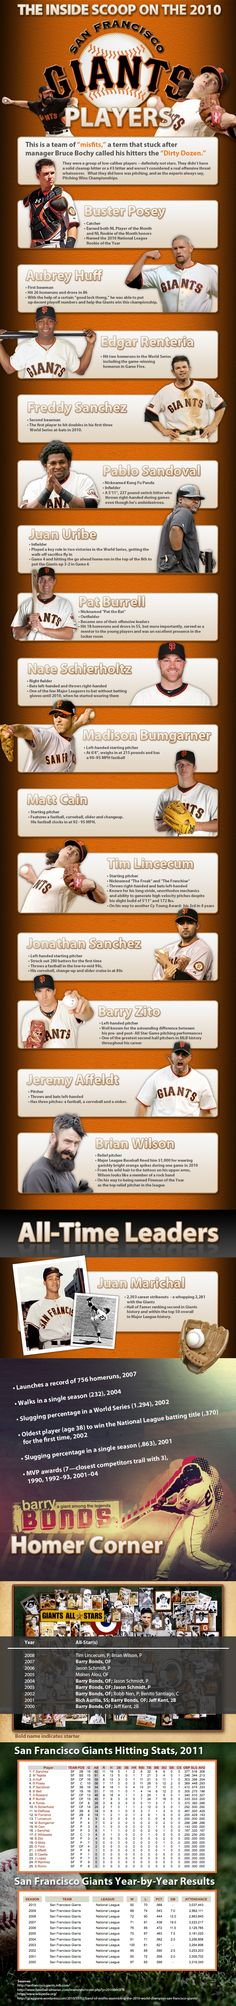 San Francisco Giants Players